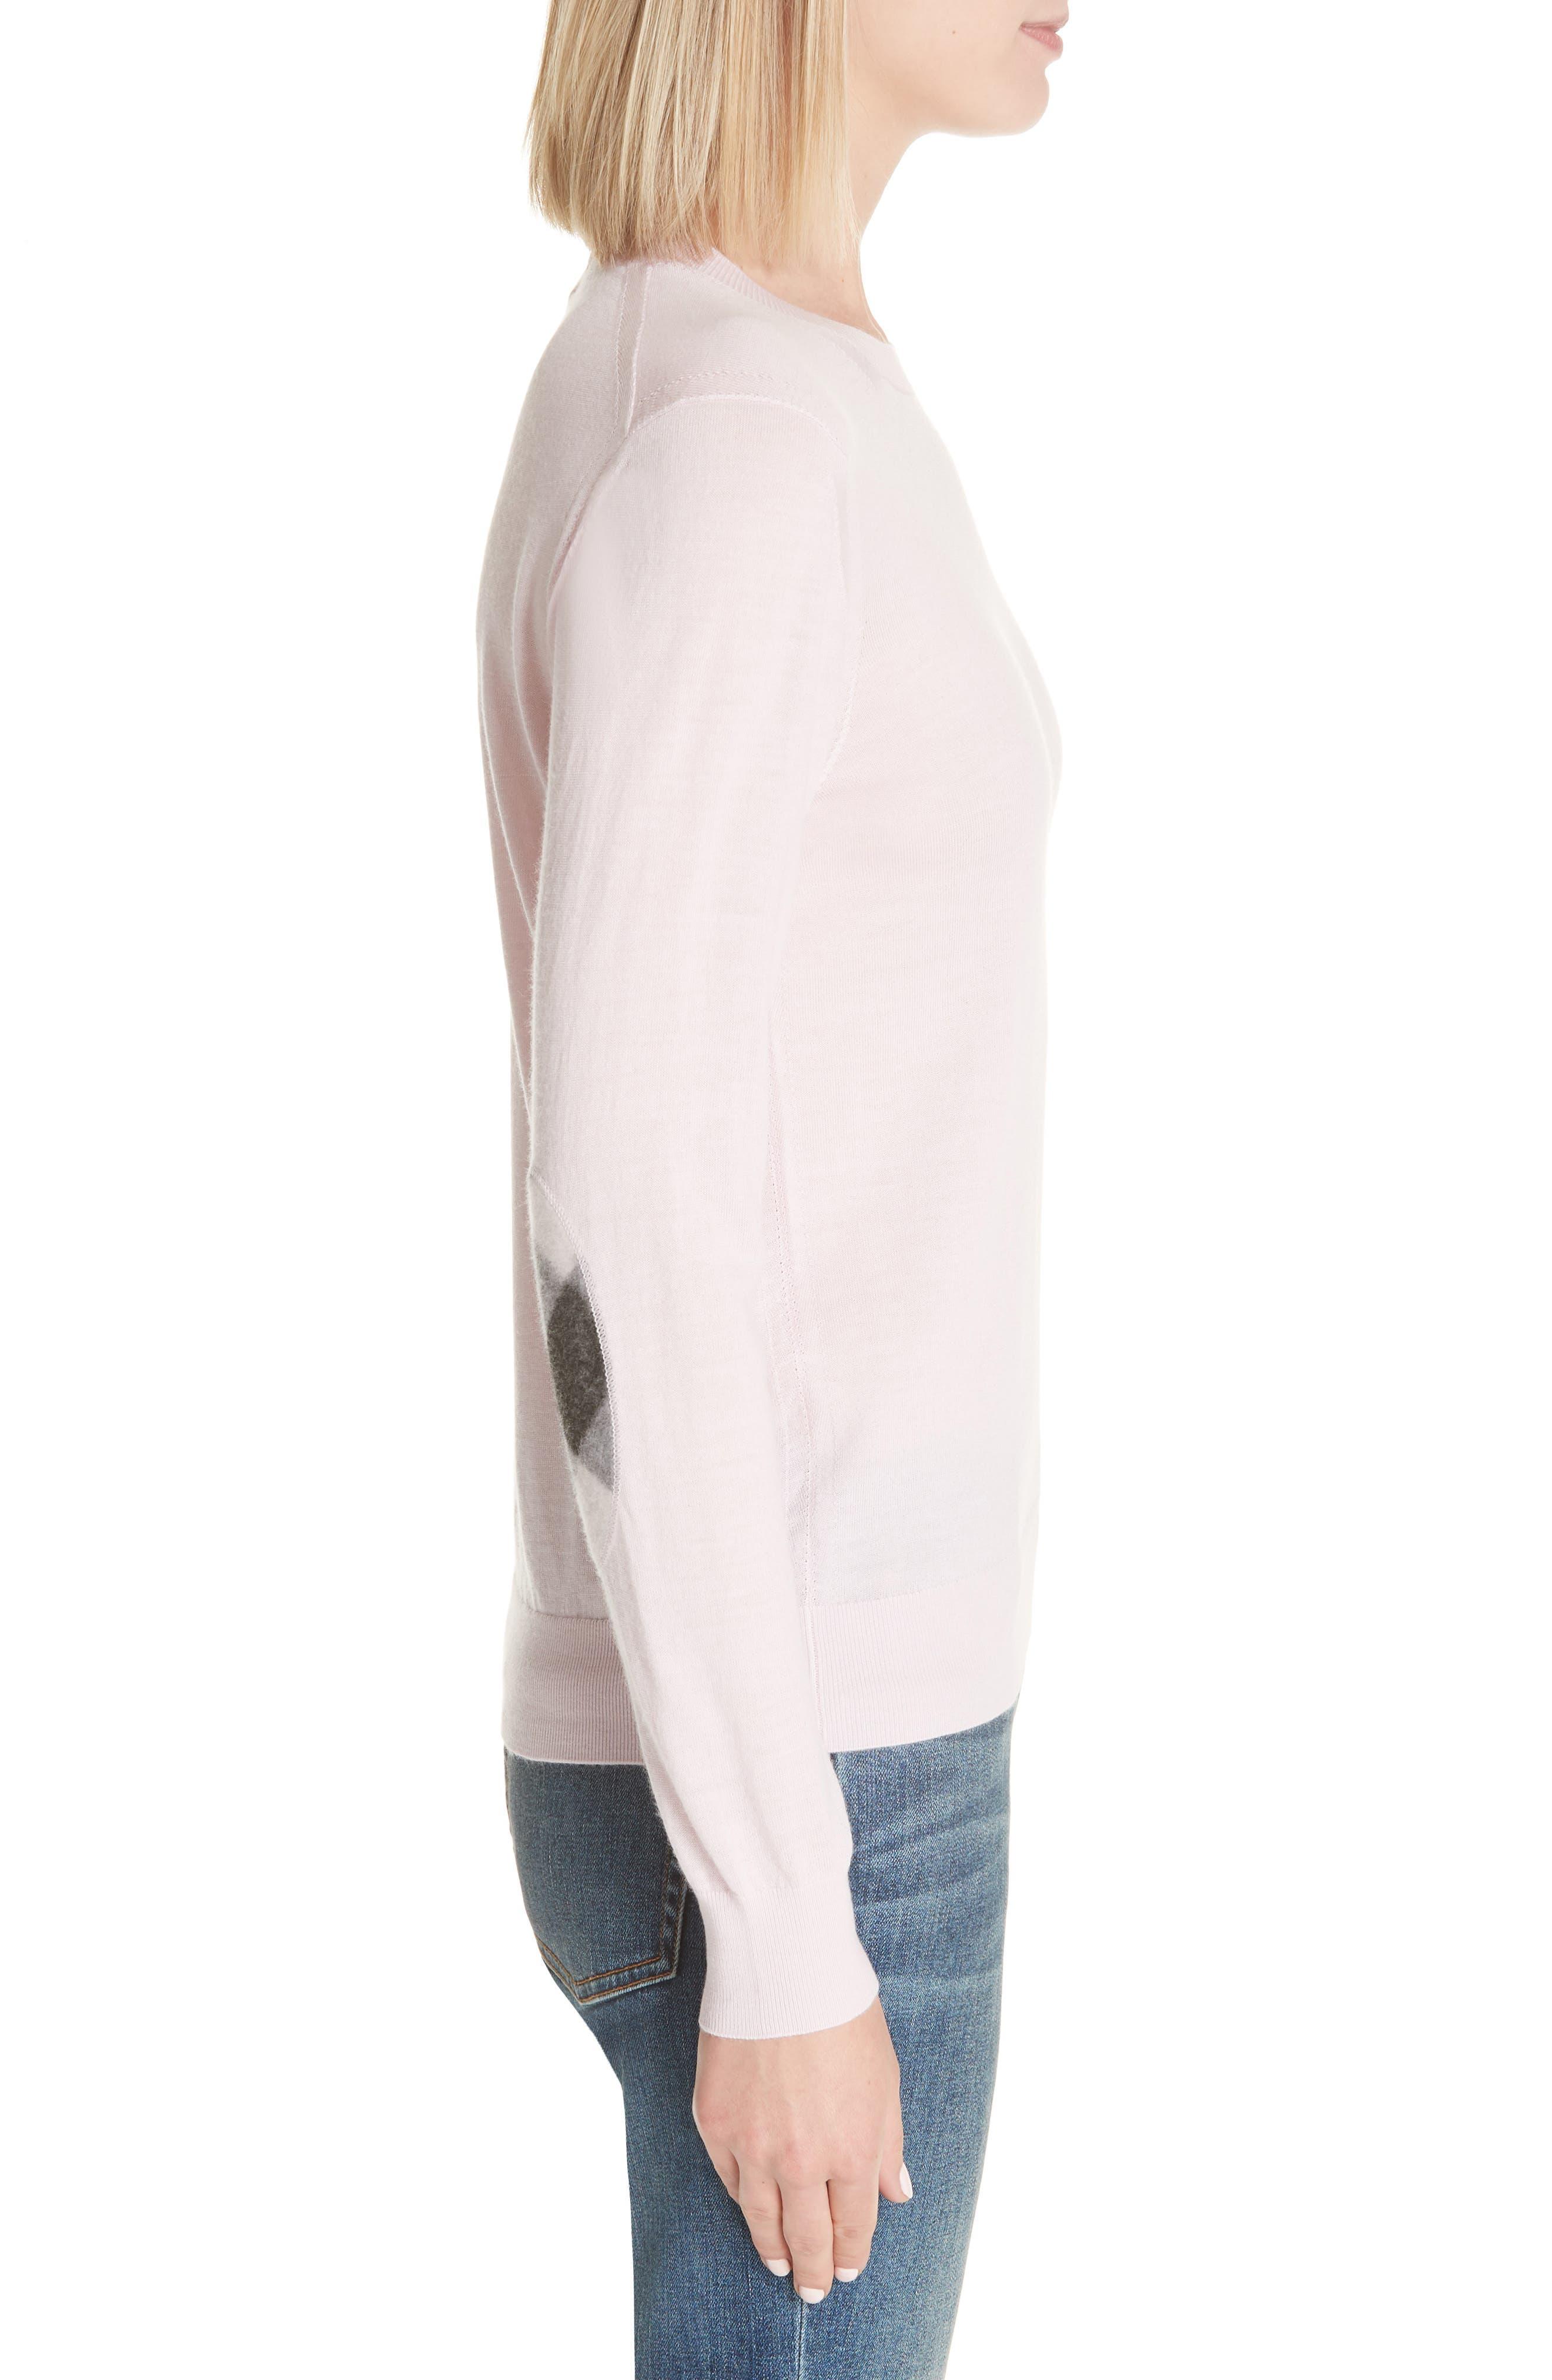 Viar Merino Wool Sweater,                             Alternate thumbnail 3, color,                             Light Pink